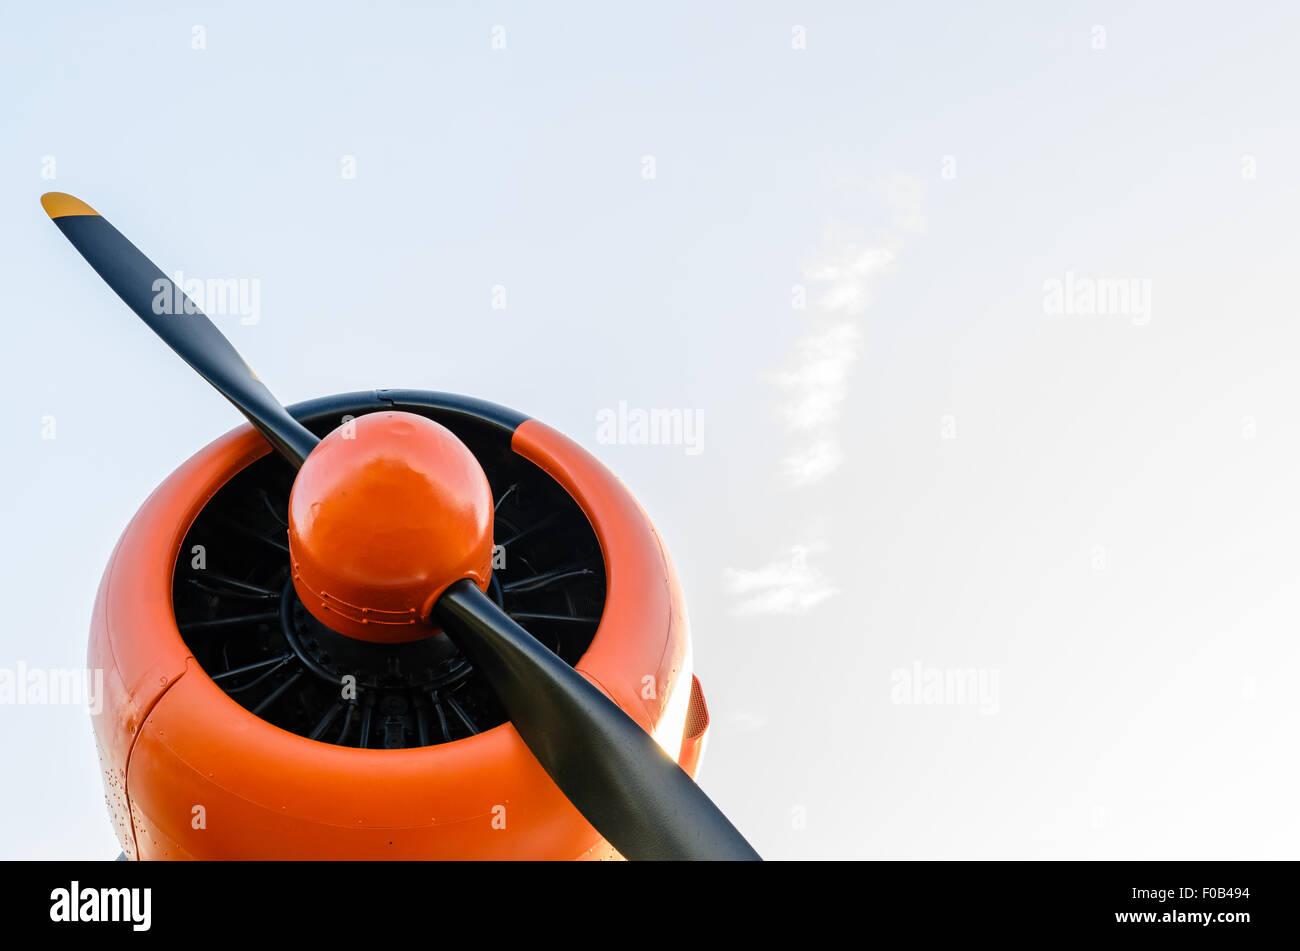 Engine propeller, Old airplane, orange, North American T-6G Texan - Stock Image